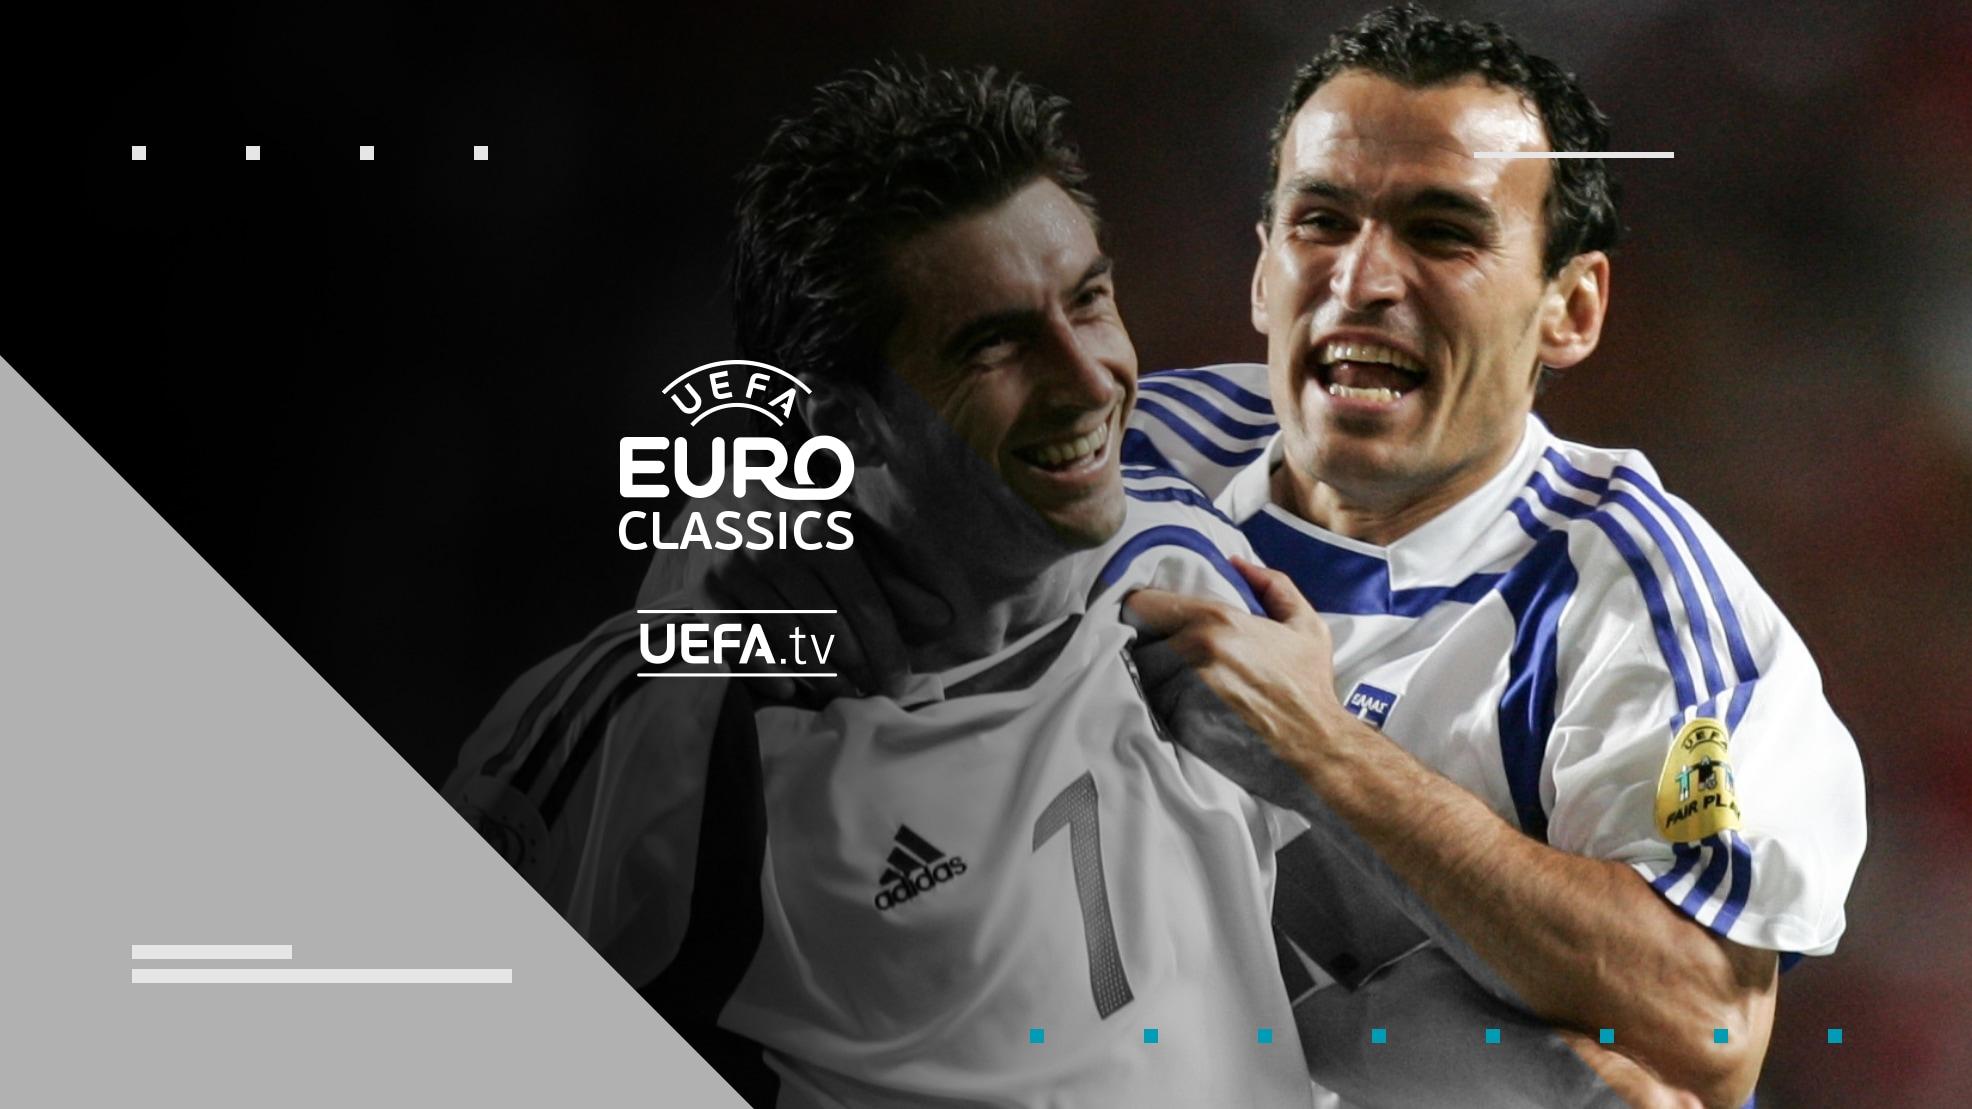 EURO 2004 FINAL PROGRAMME 04//07//2004 *FOOTBALL PROGRAMME* GREECE V PORTUGAL